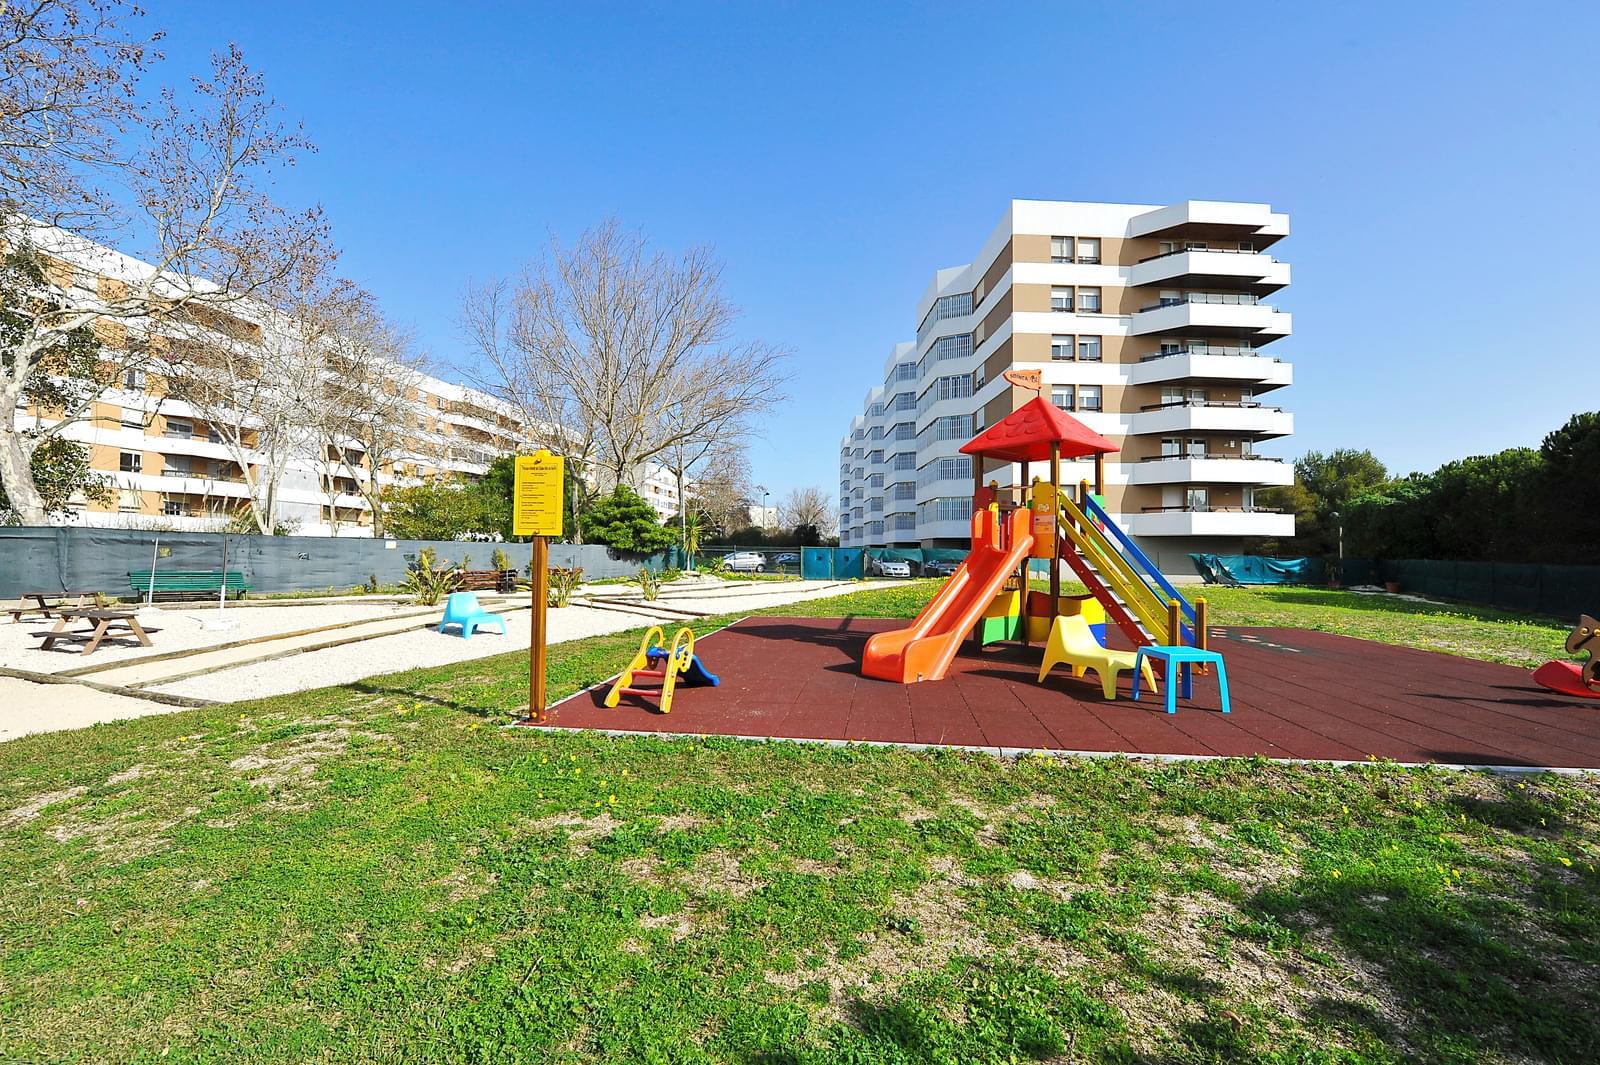 pf17071-apartamento-t4-oeiras-a5b57125-95e7-41dc-b30c-d728064b2f45